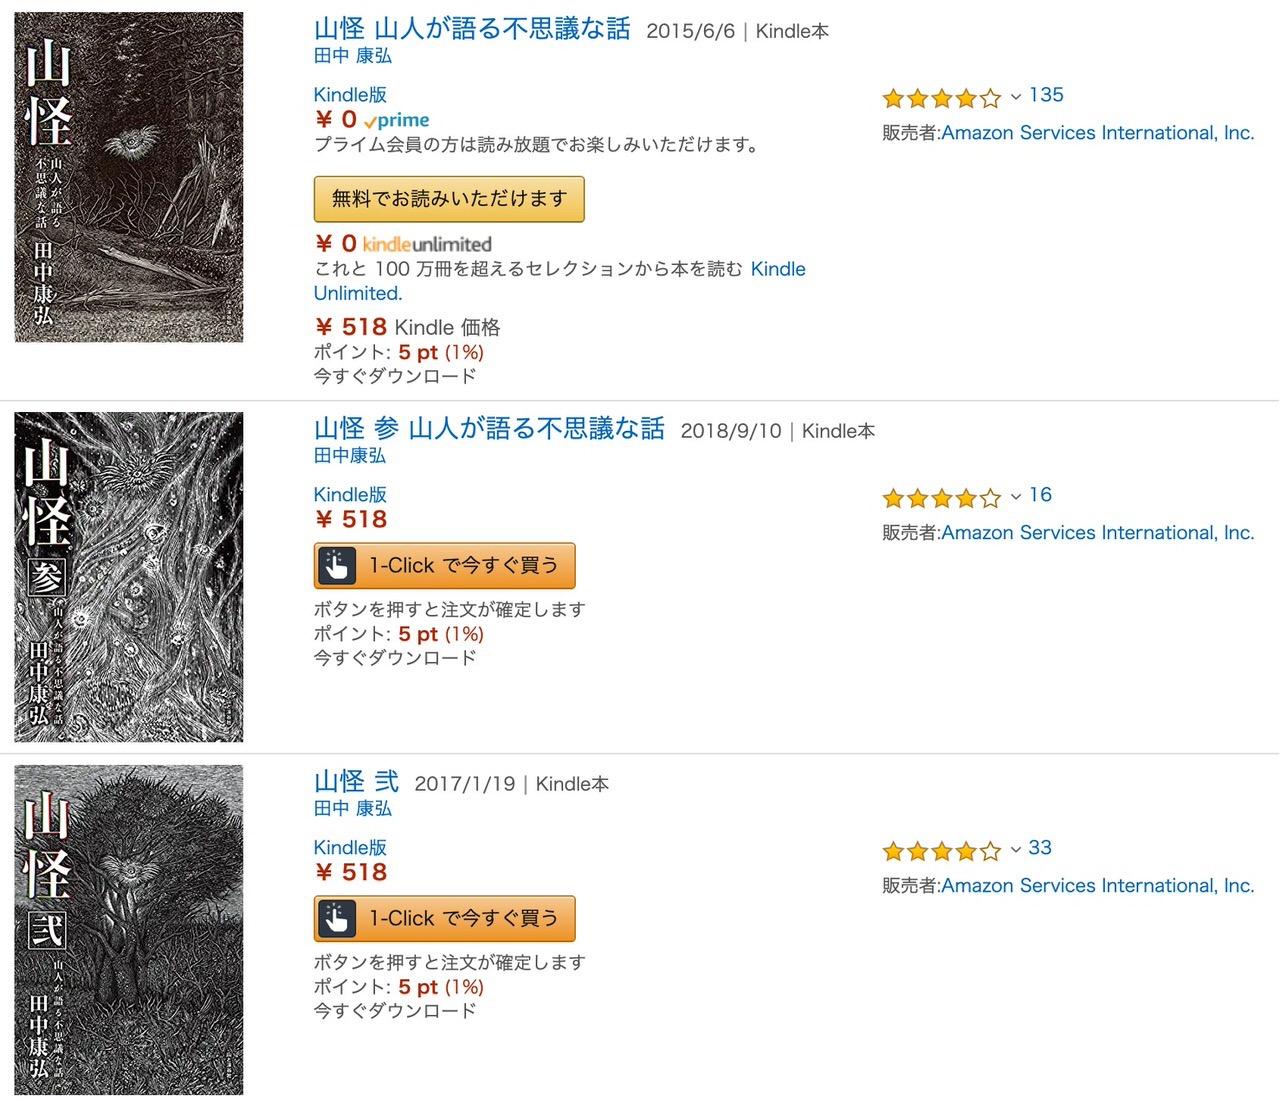 【Kindleセール】山人が語る不思議な話「山怪」シリーズ20万部突破記念フェア(8/1まで)